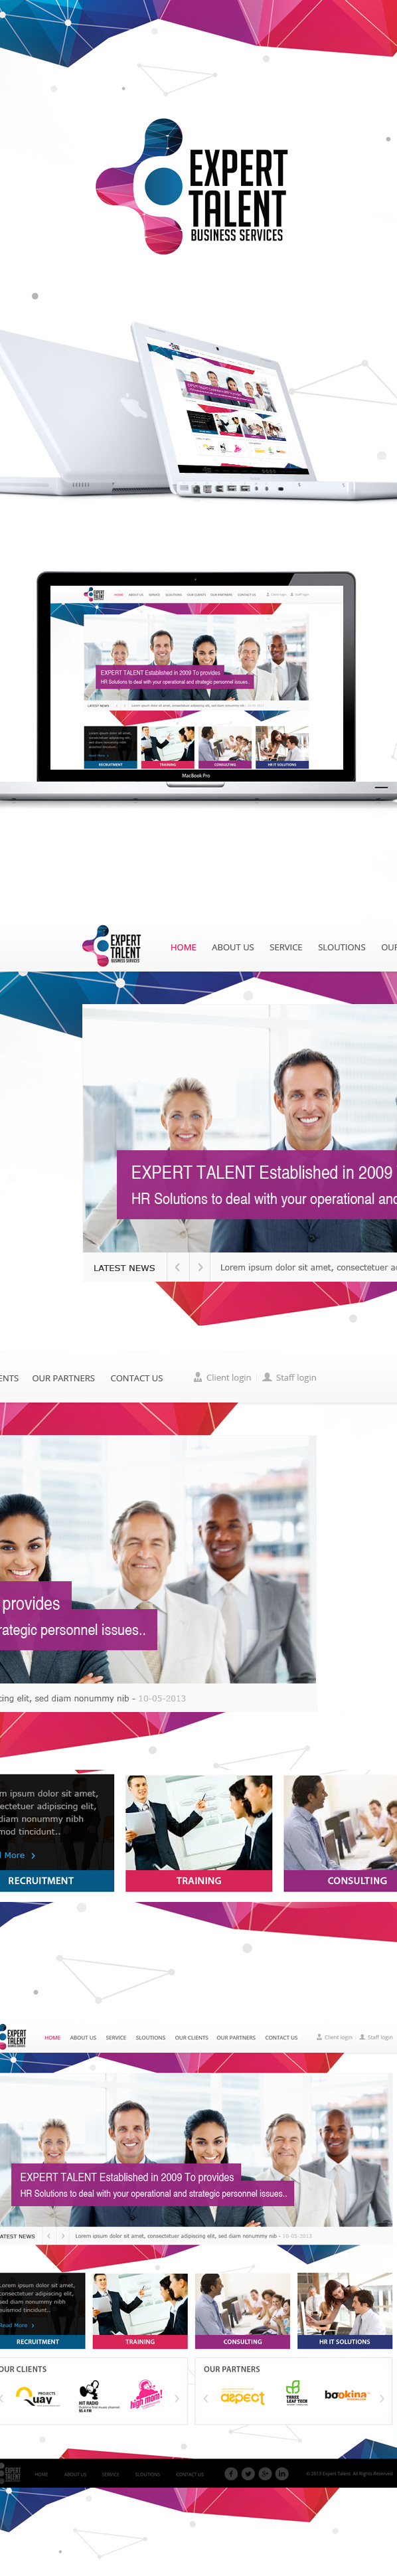 CREATIVE TALENT HR human resource IT solutions Professionals